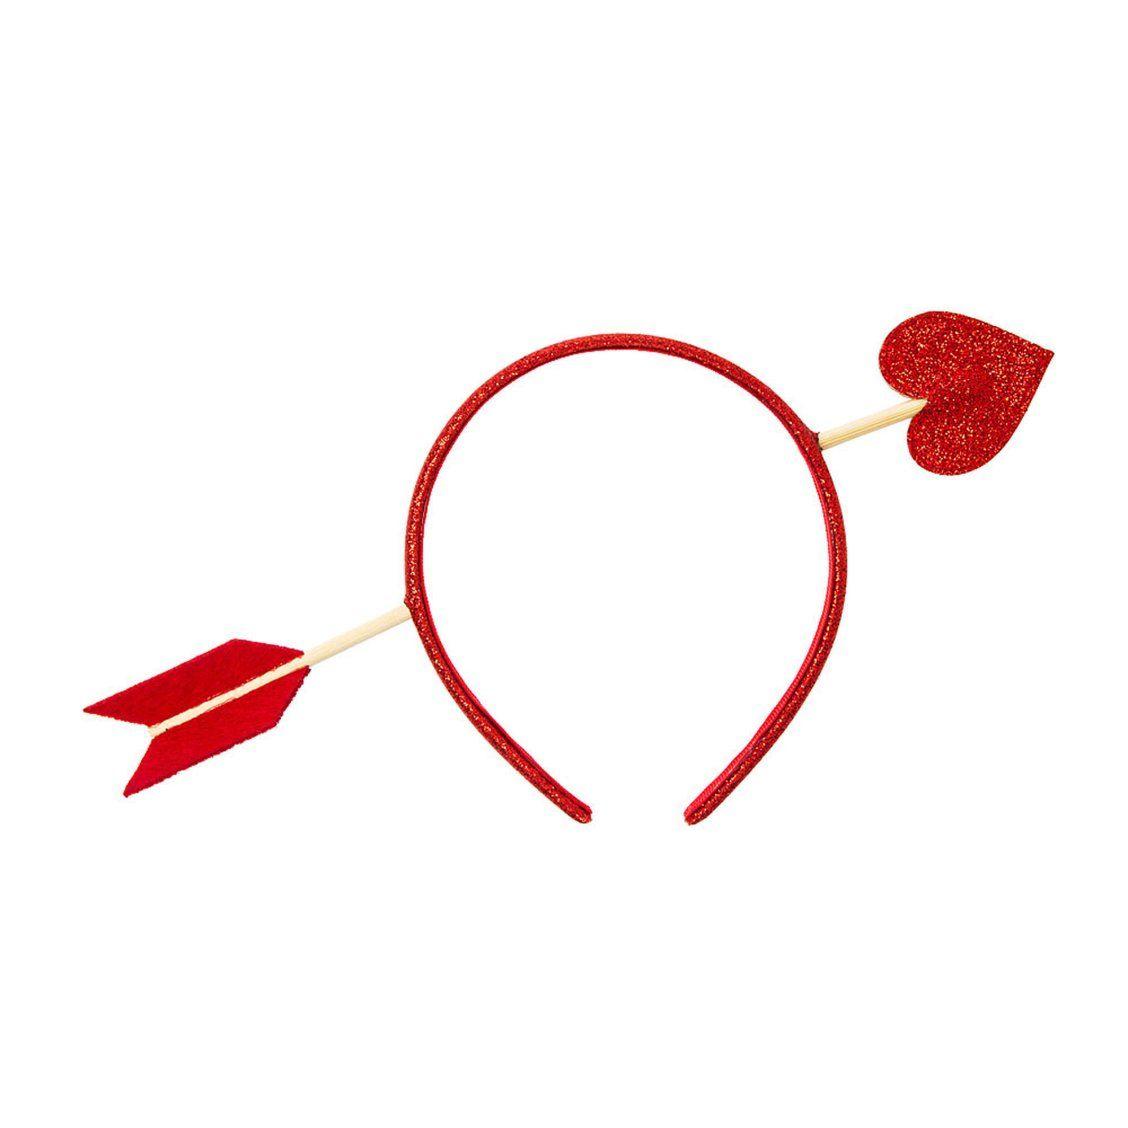 Arrowhead clipart heart shaped. Kids valentine s day